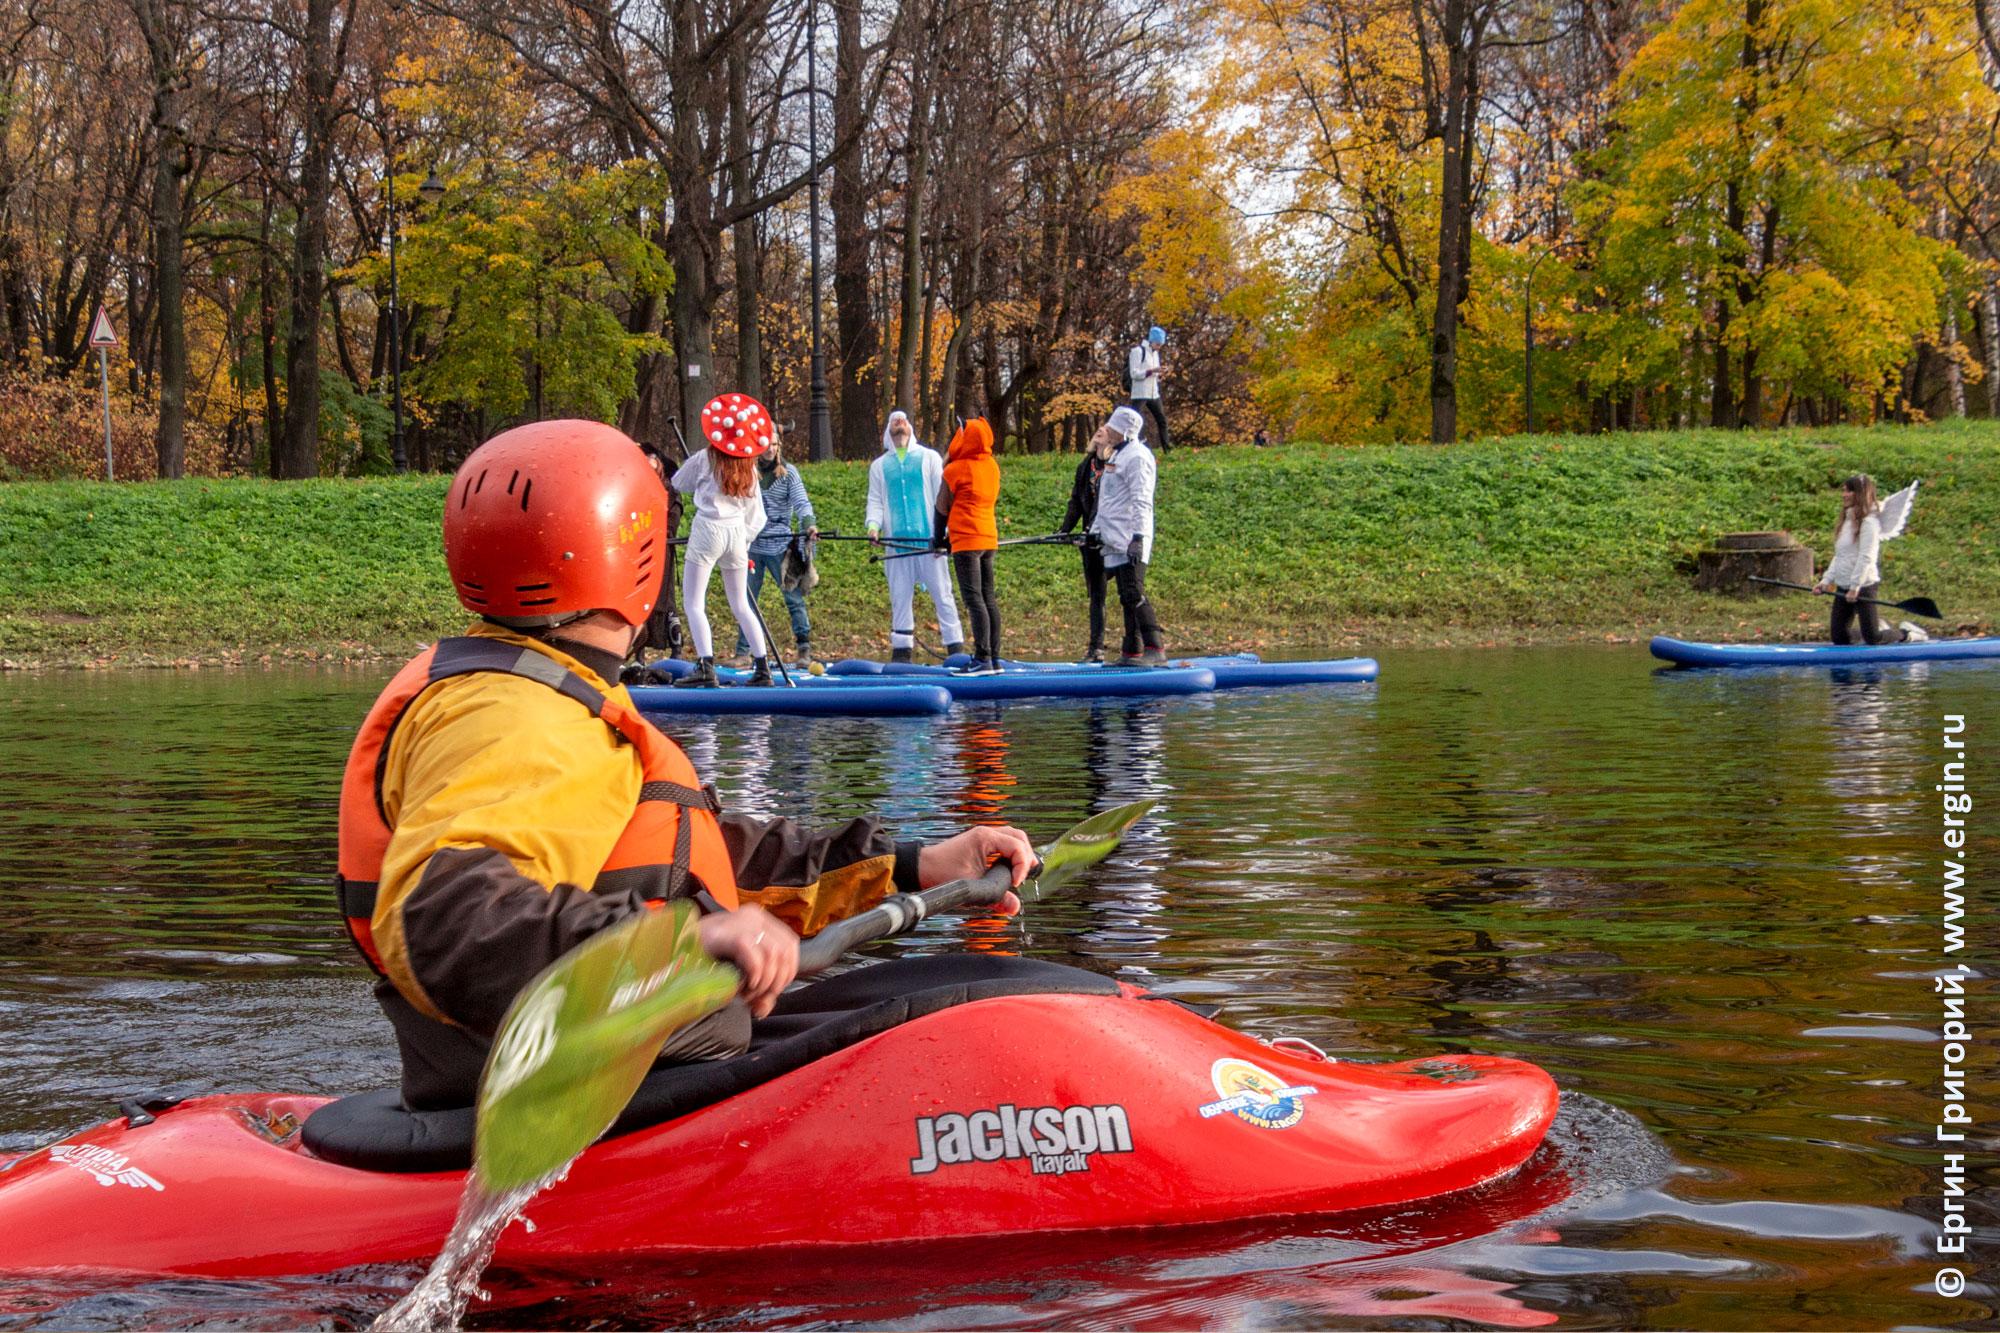 SUP-серферы и каякер на воде СПб